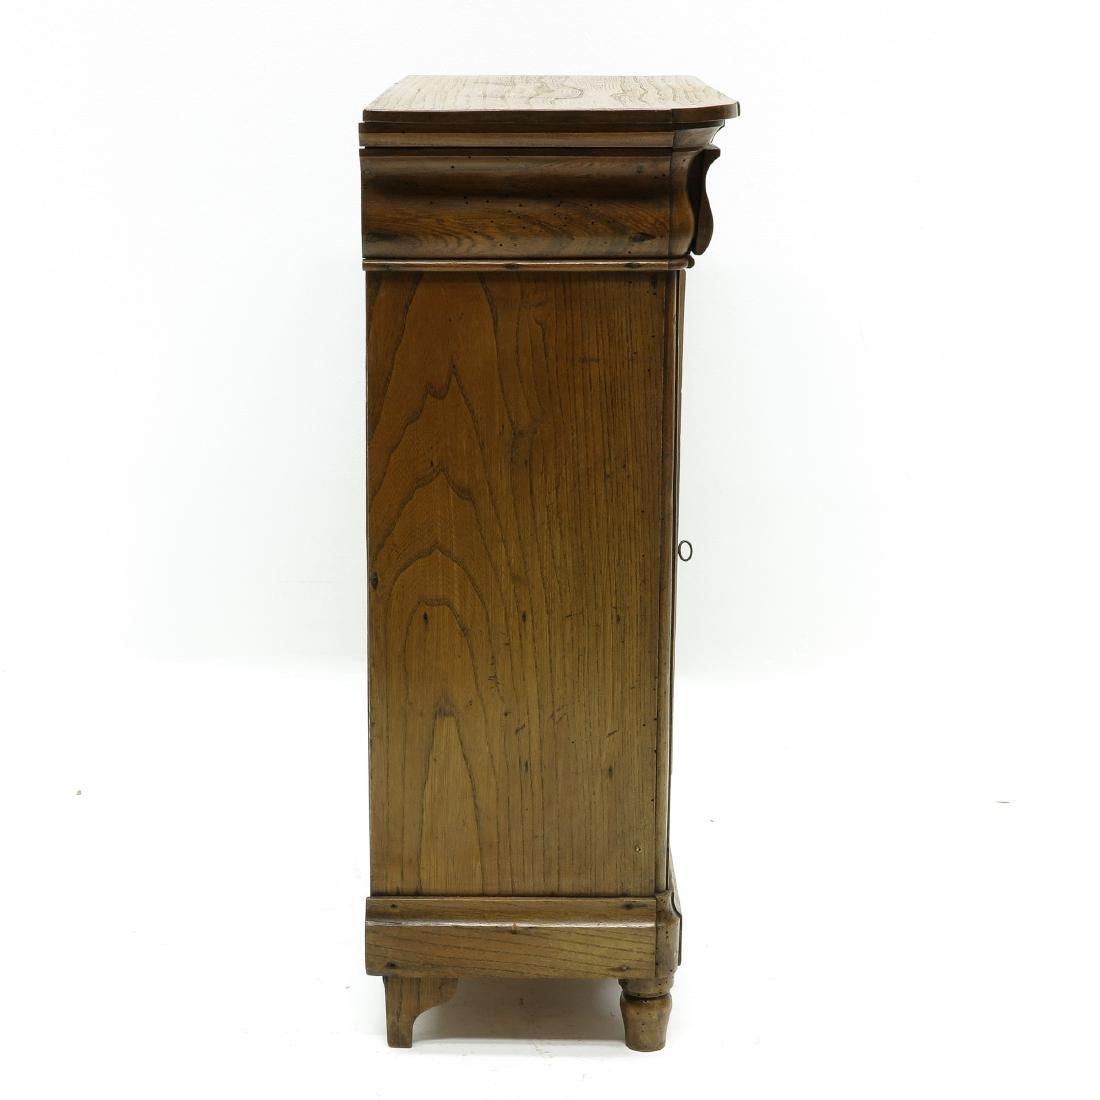 A Miniature Biedermeier Cabinet - 5